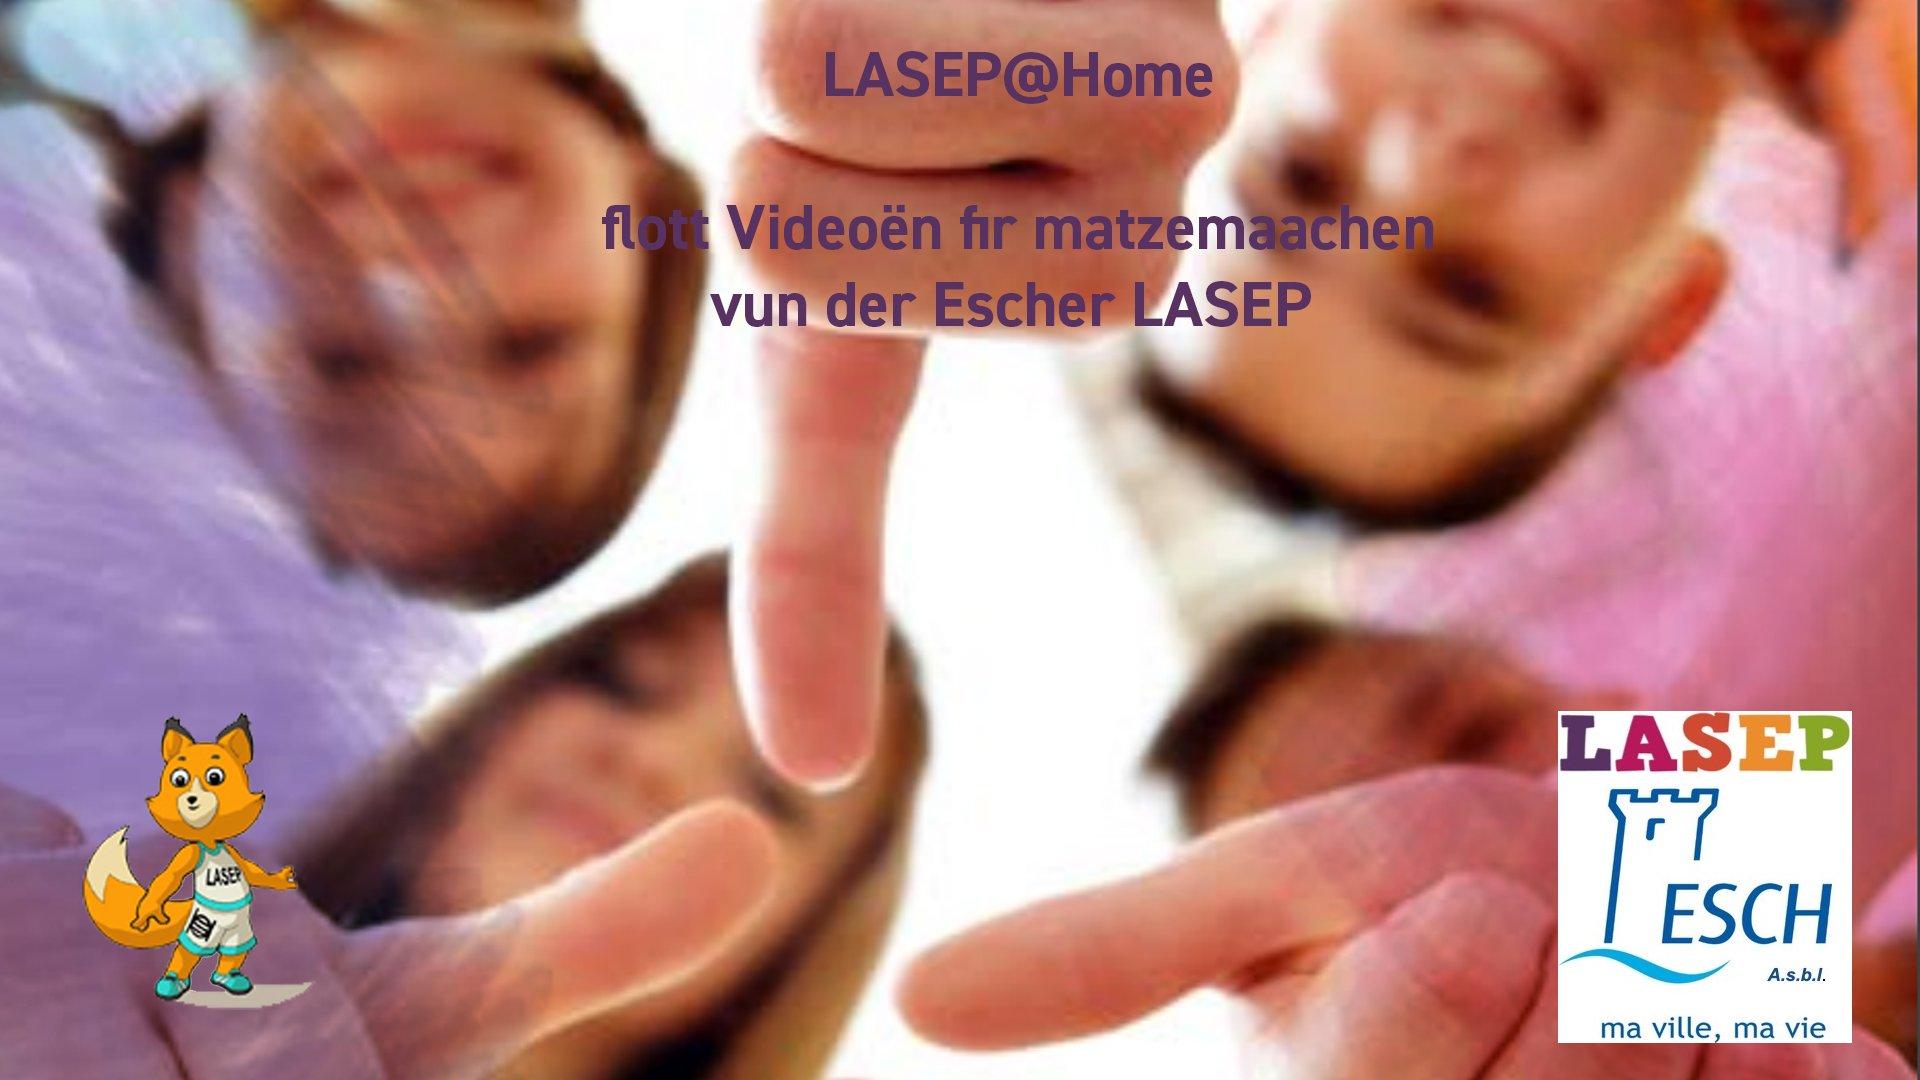 Lasep @ Home - 22.4.2020